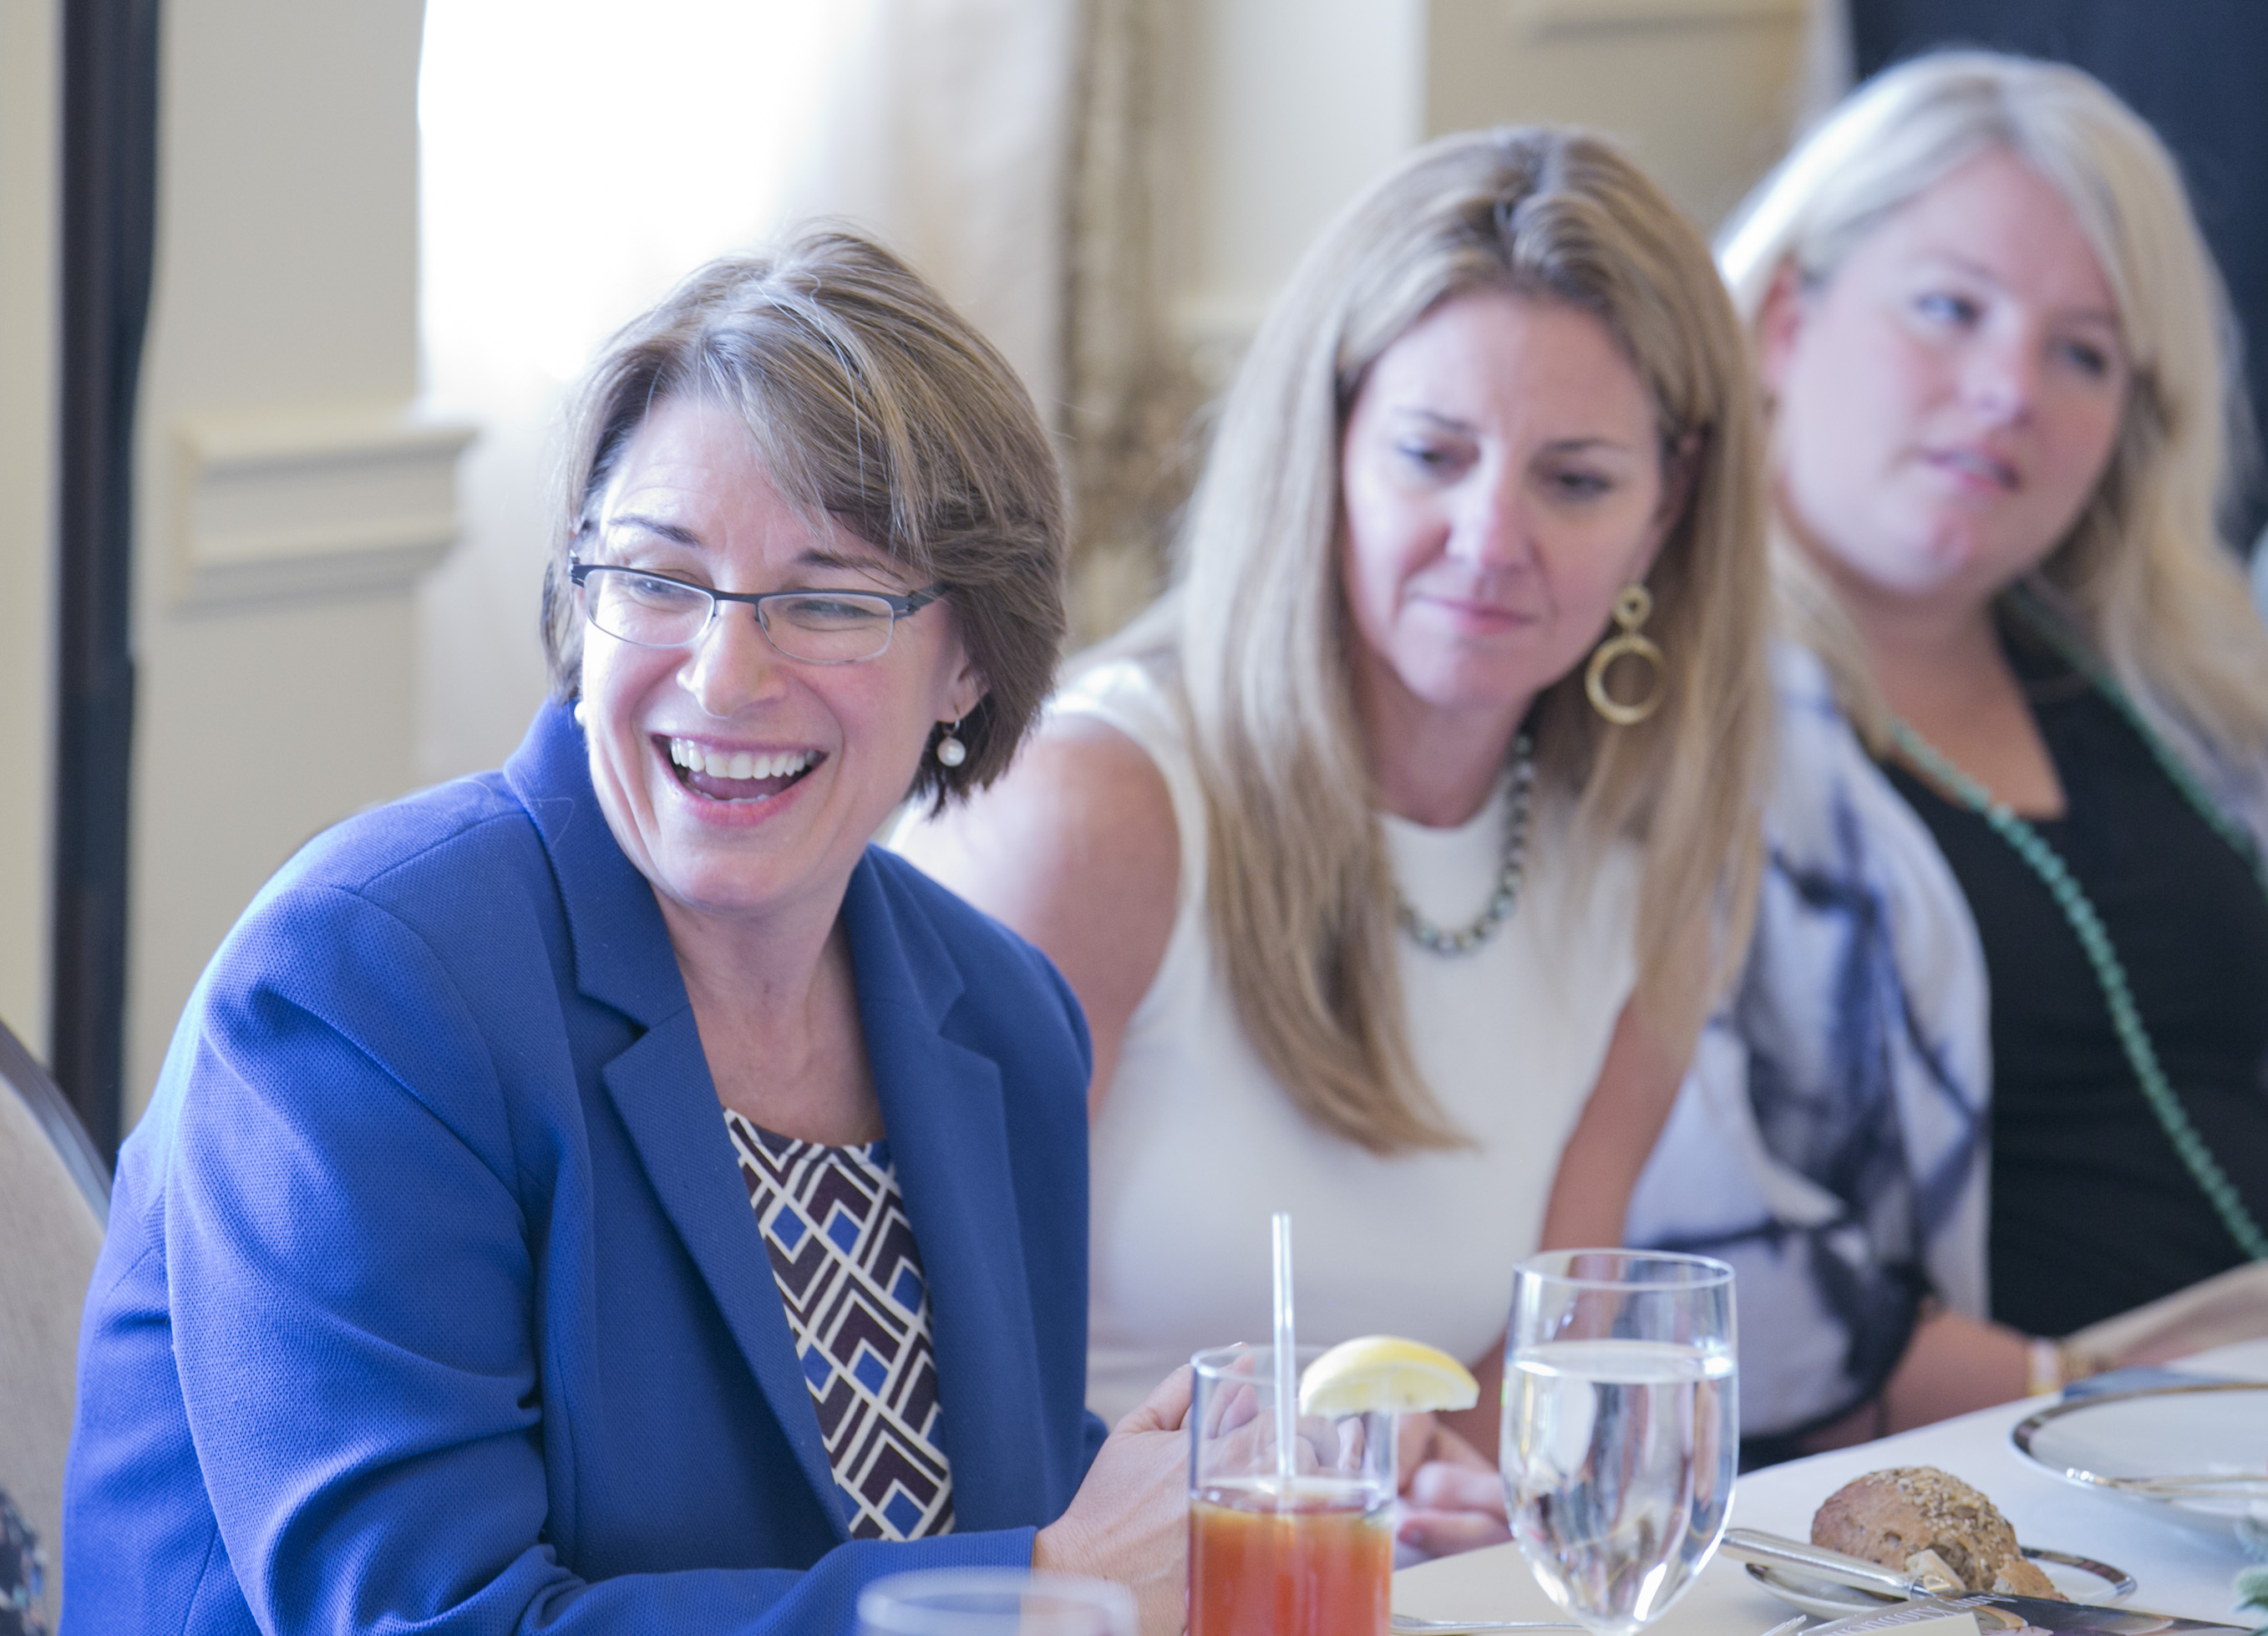 Senator Amy Klobuchar at at the Washington Womens' Technology Lucheon